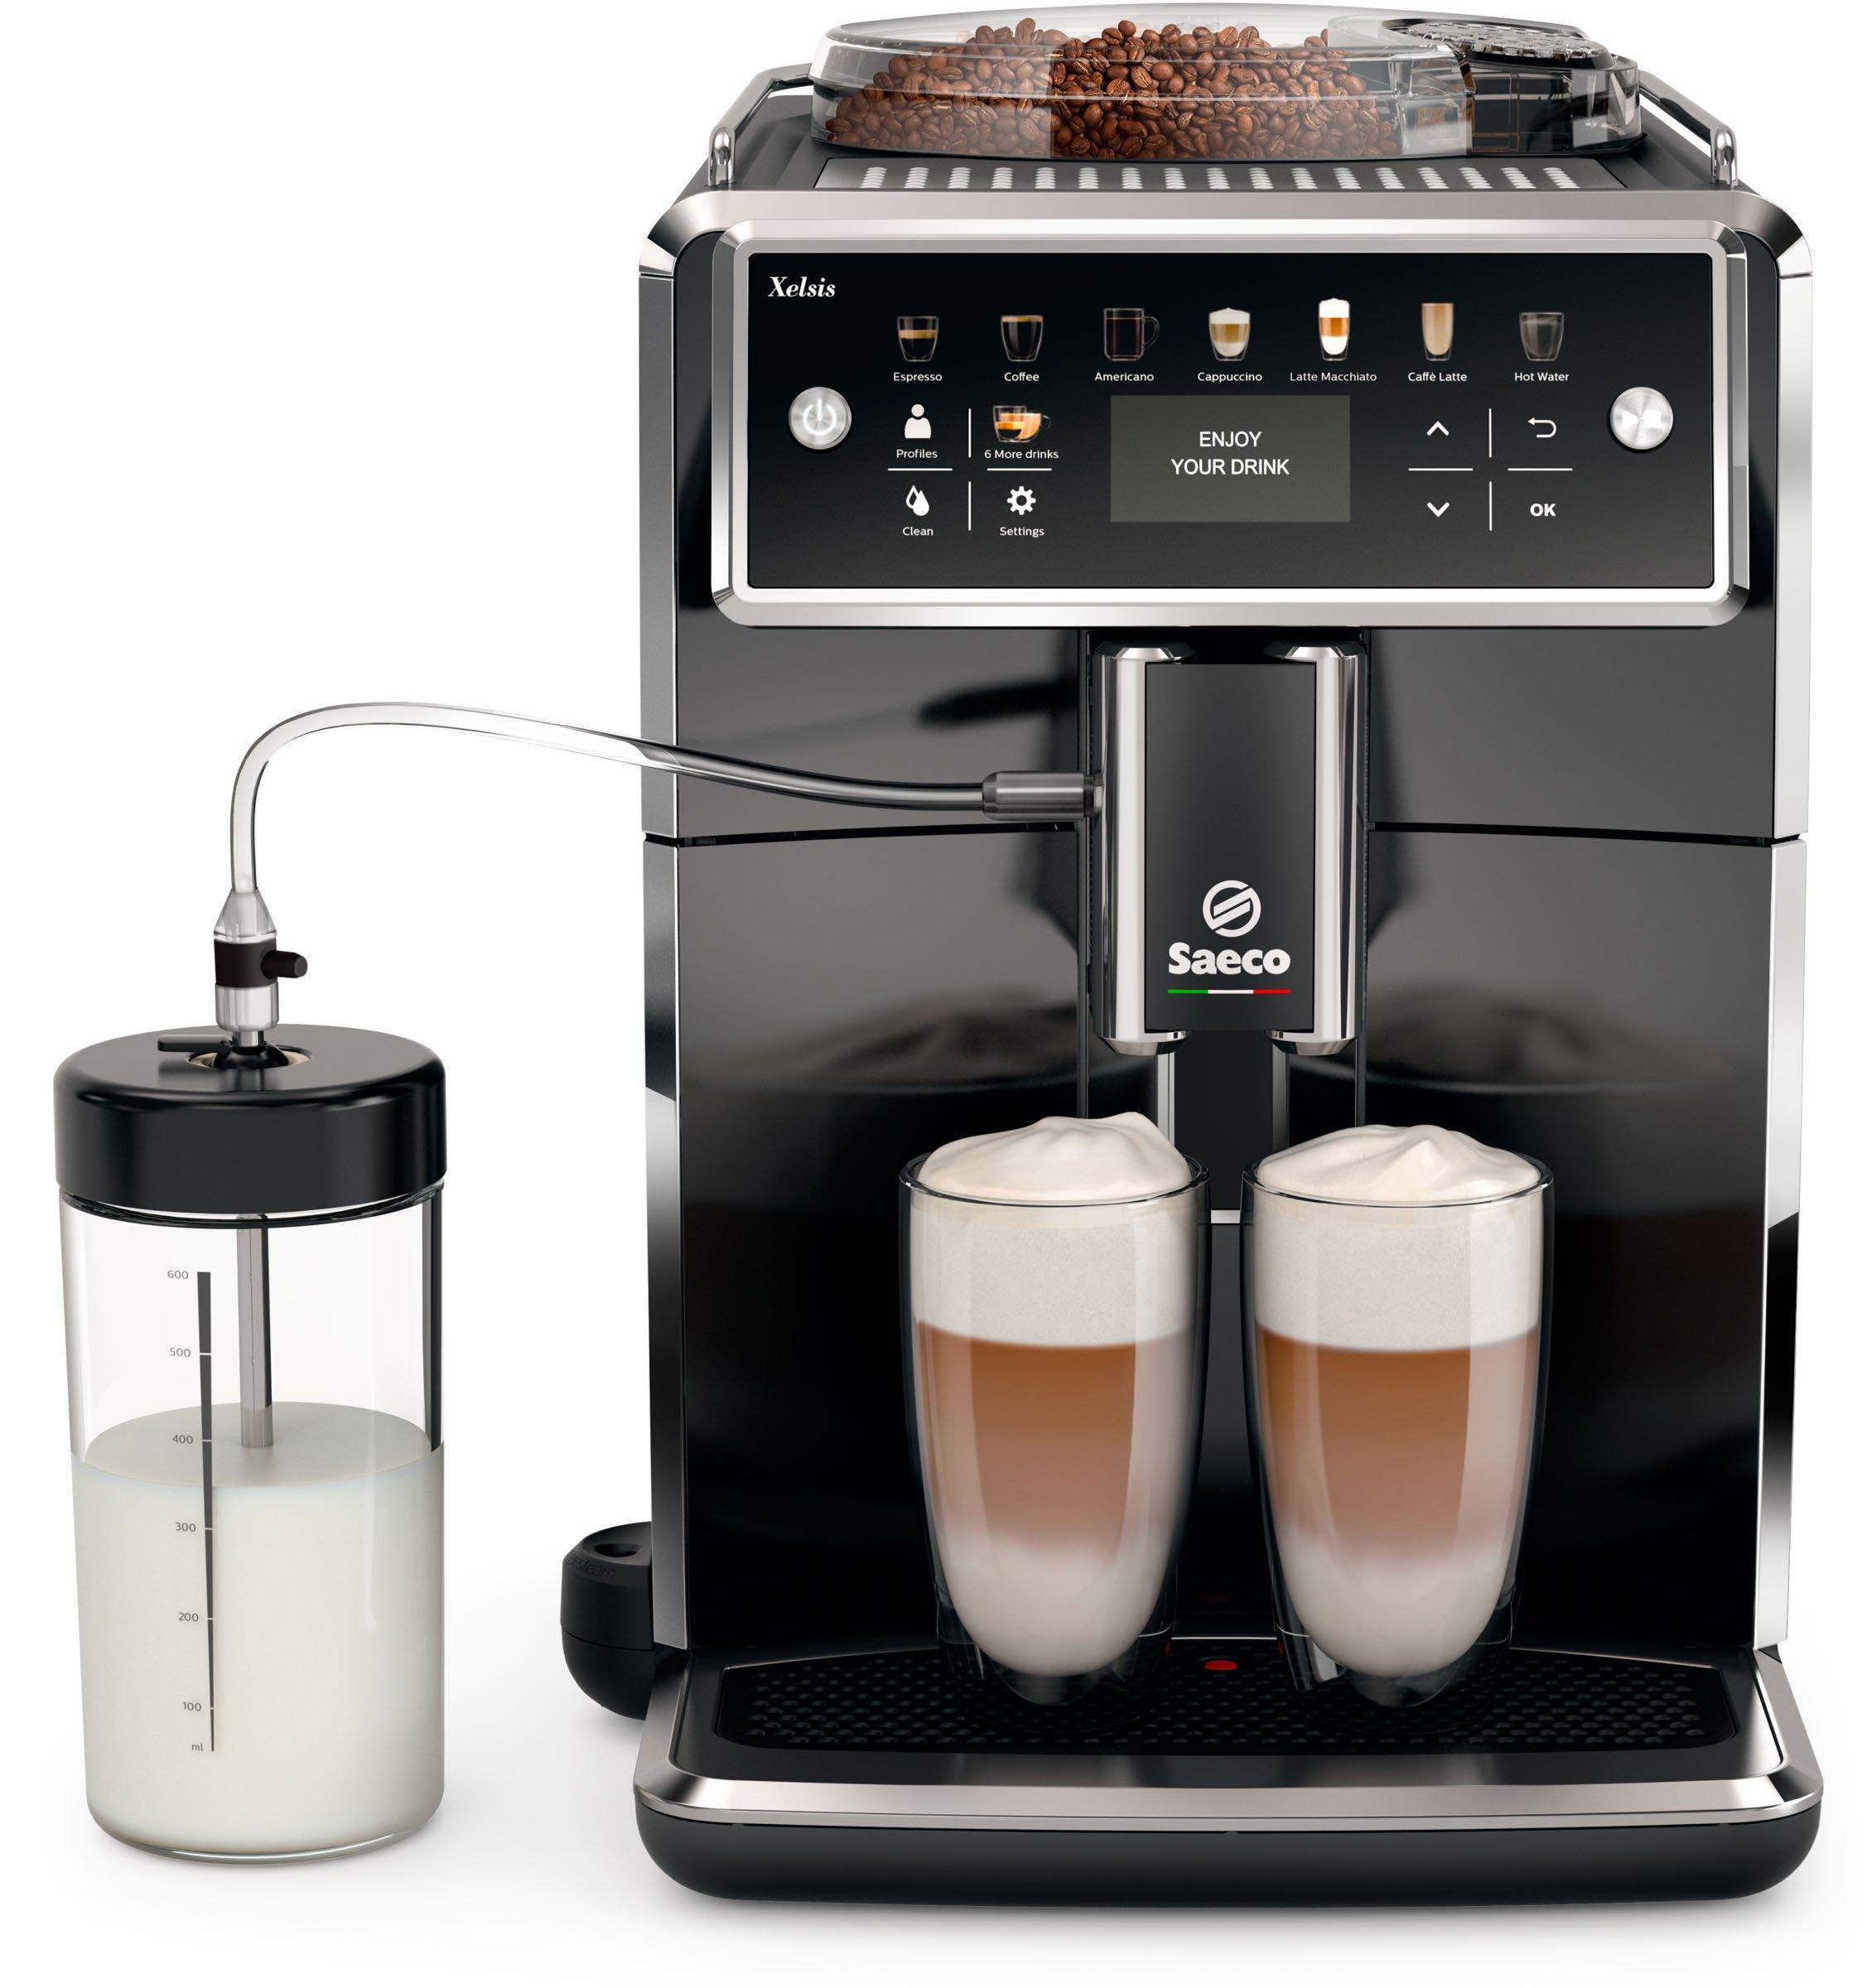 Saeco-Xelsis-SM758000-Kaffeevollautomat-LED-Display-DE-Version-pianoschwarz